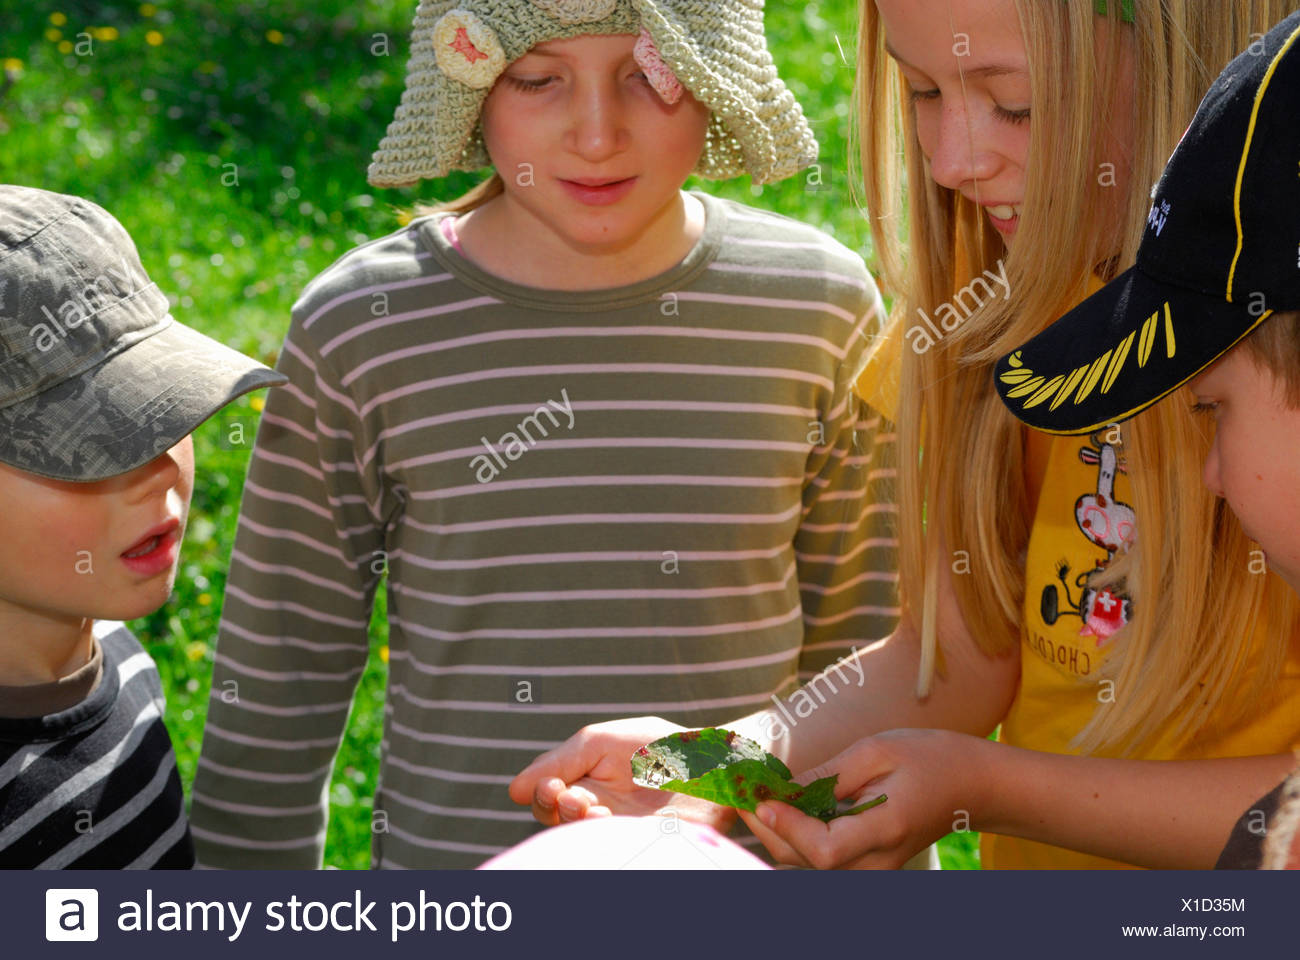 Children looking at something on a leaf, Bavarian Alps, Upper Bavaria, Bavaria, Germany - Stock Image